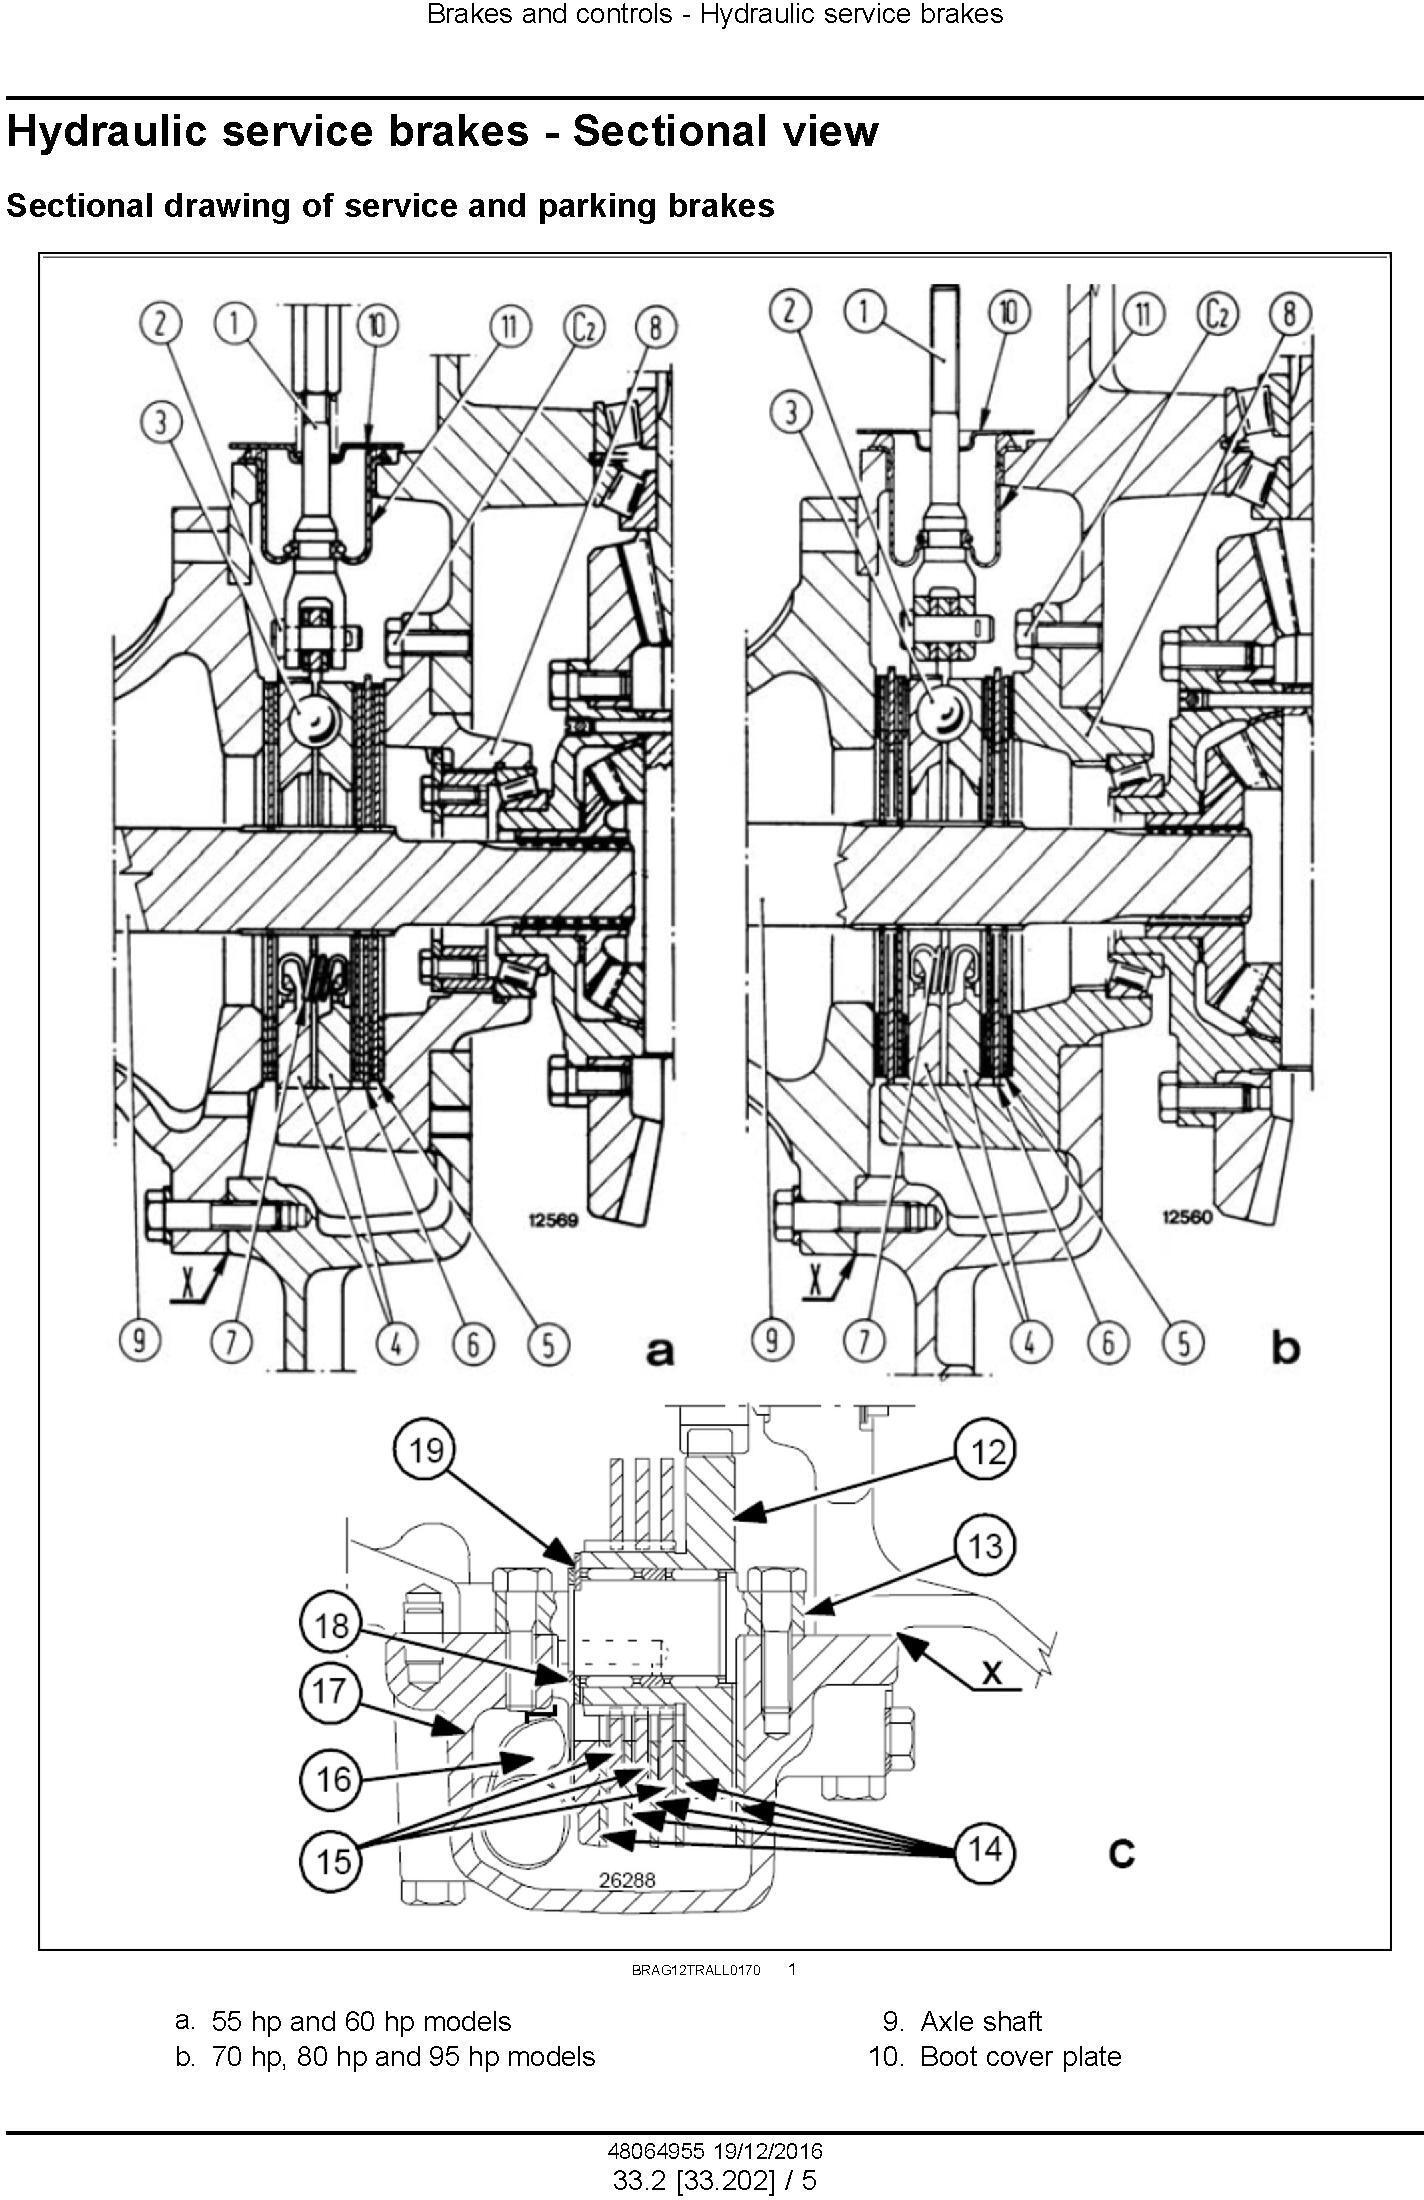 New Holland TD4020F, TD4030F, TD4040F Tractor Service Manual (Europe) - 3